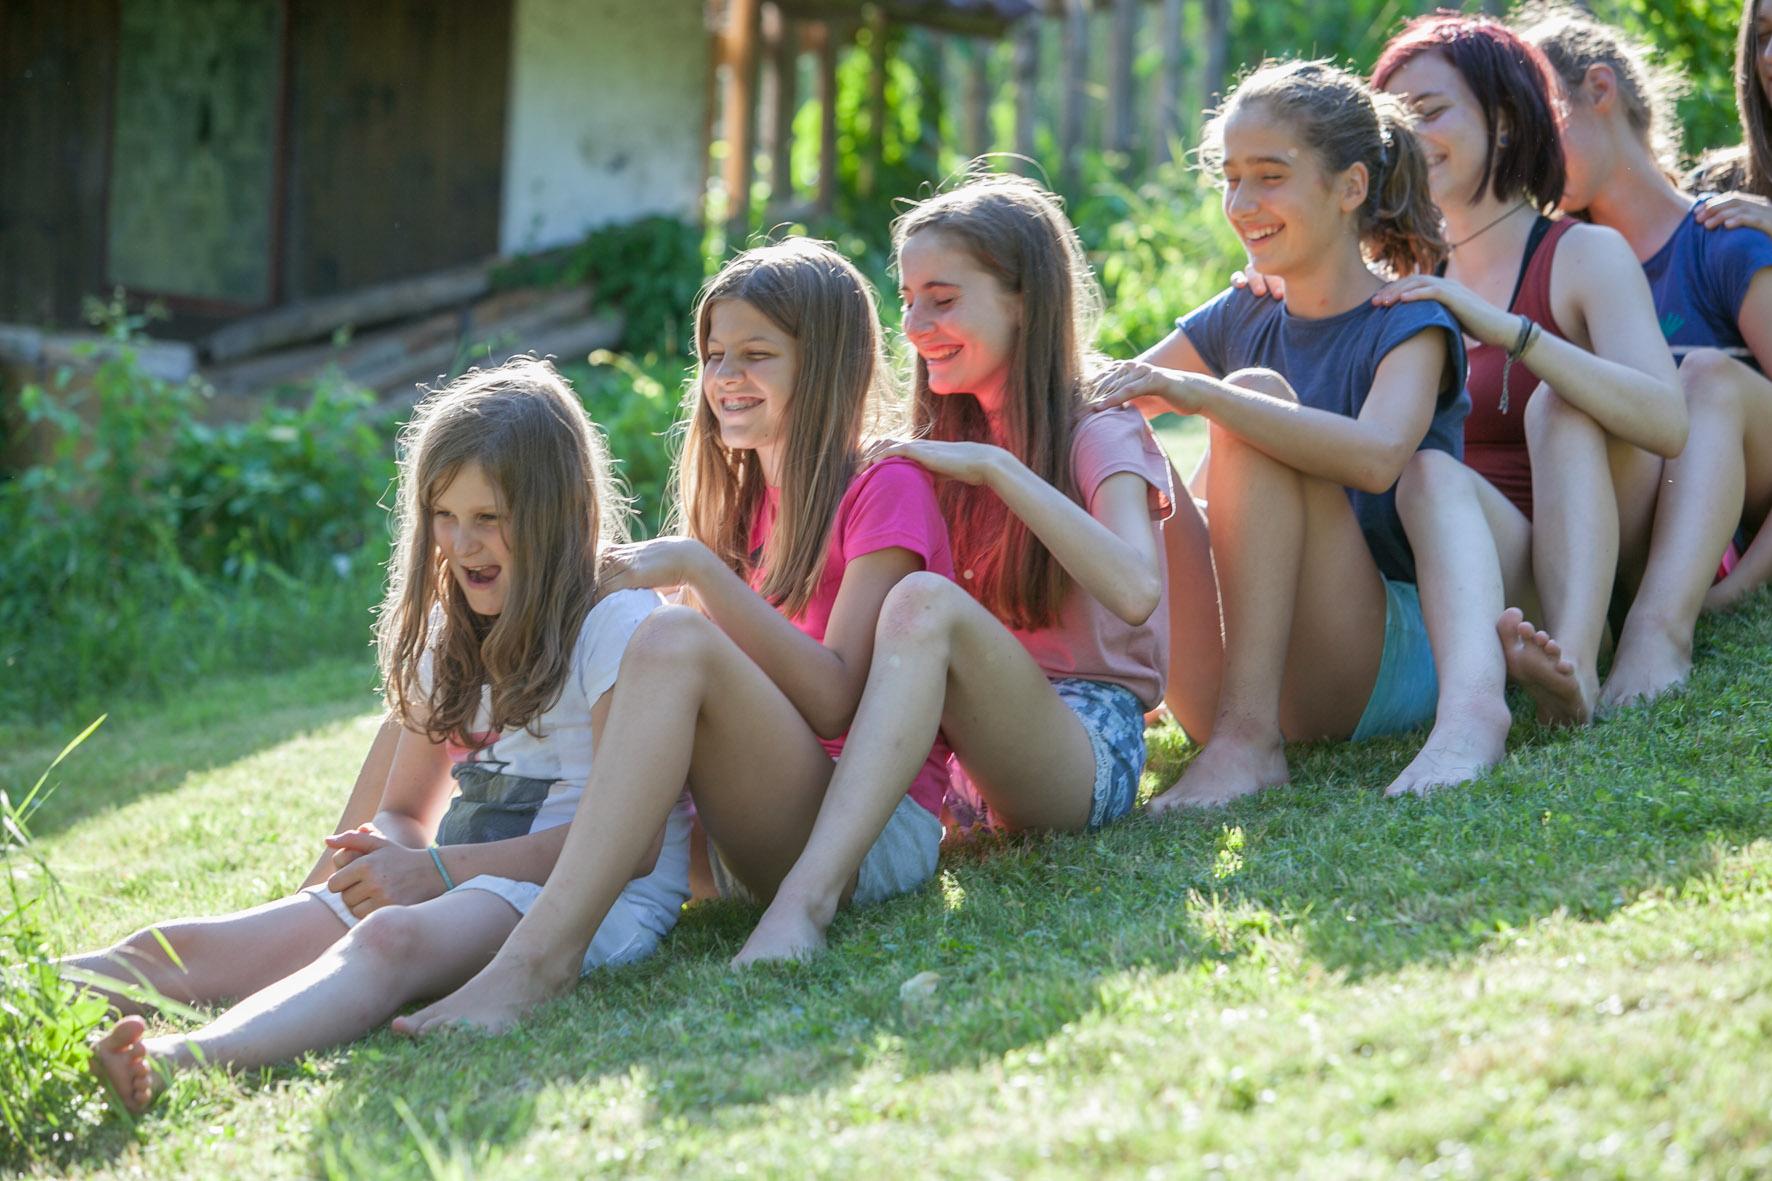 Foto: Teenageryoga Mädchen bei Partnerübung